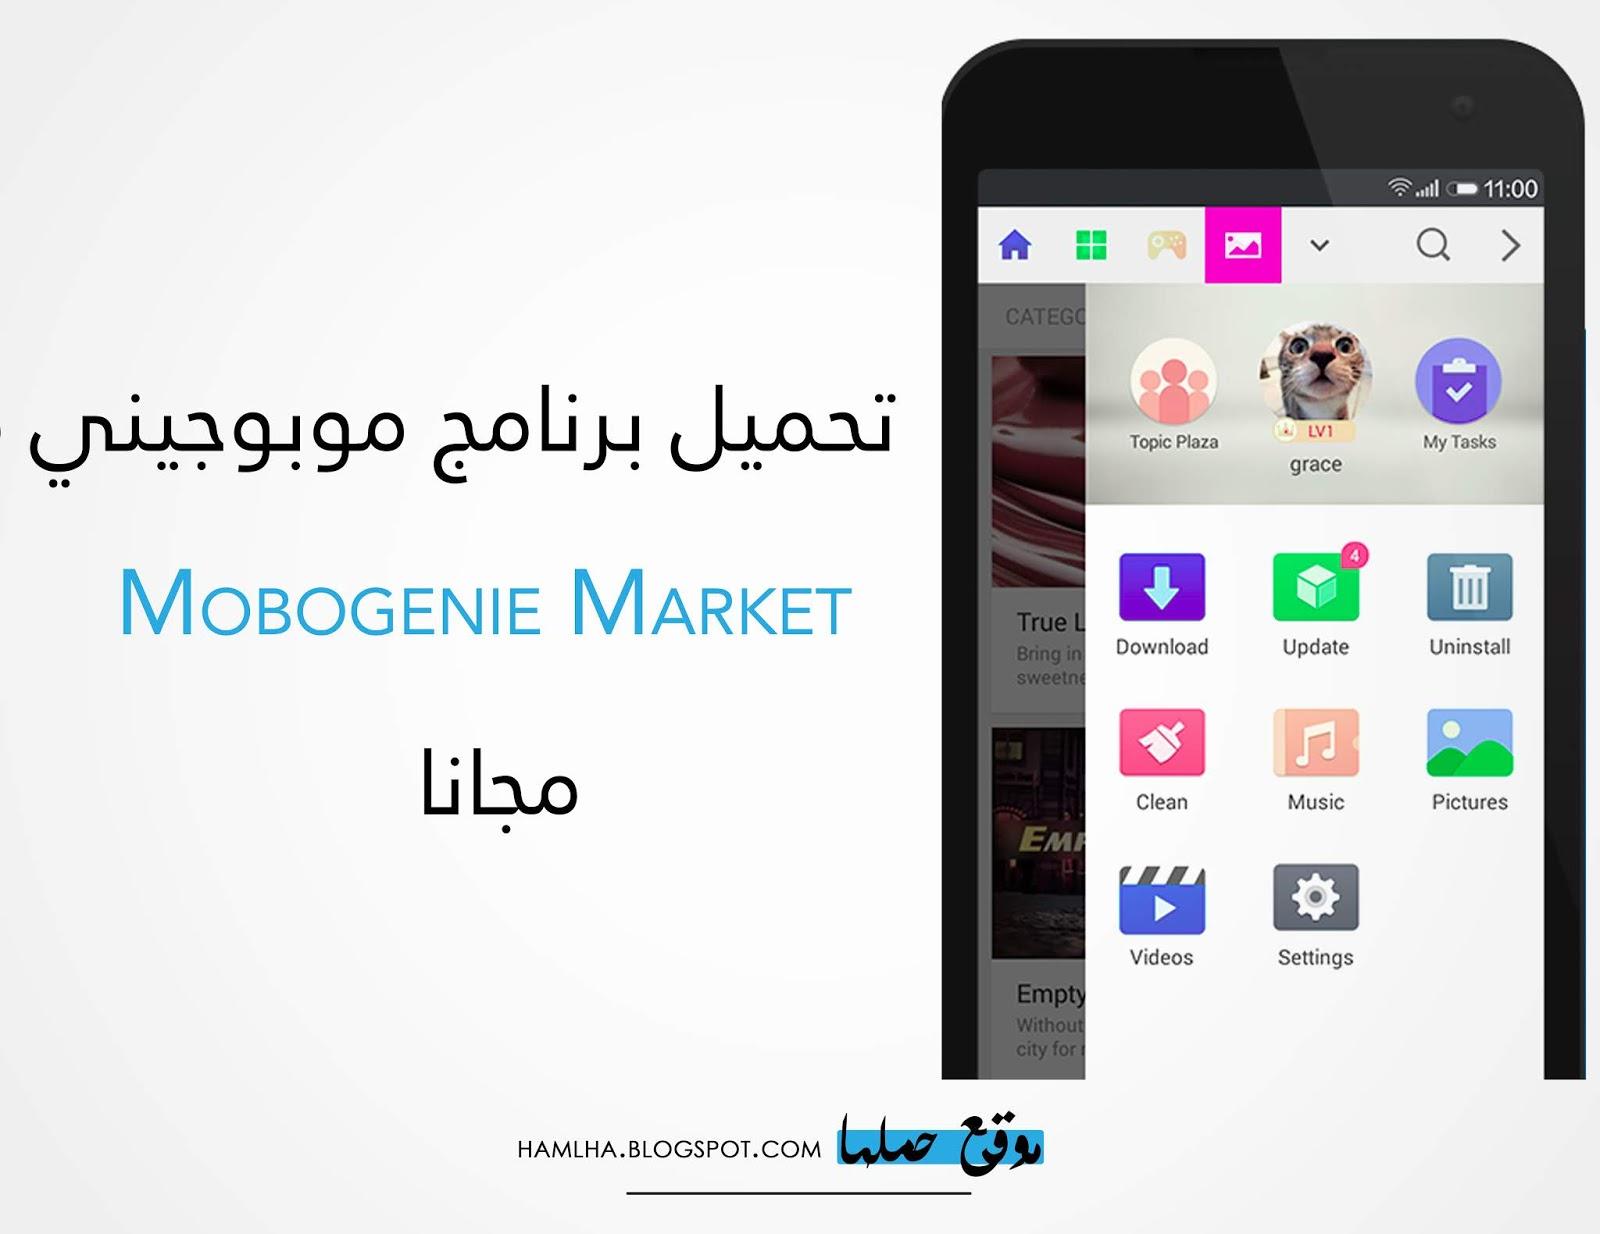 890c53ba7 تحميل تطبيق موبوجيني عربي Download Mobogenie 2018 متجر تطبيقات الاندرويد